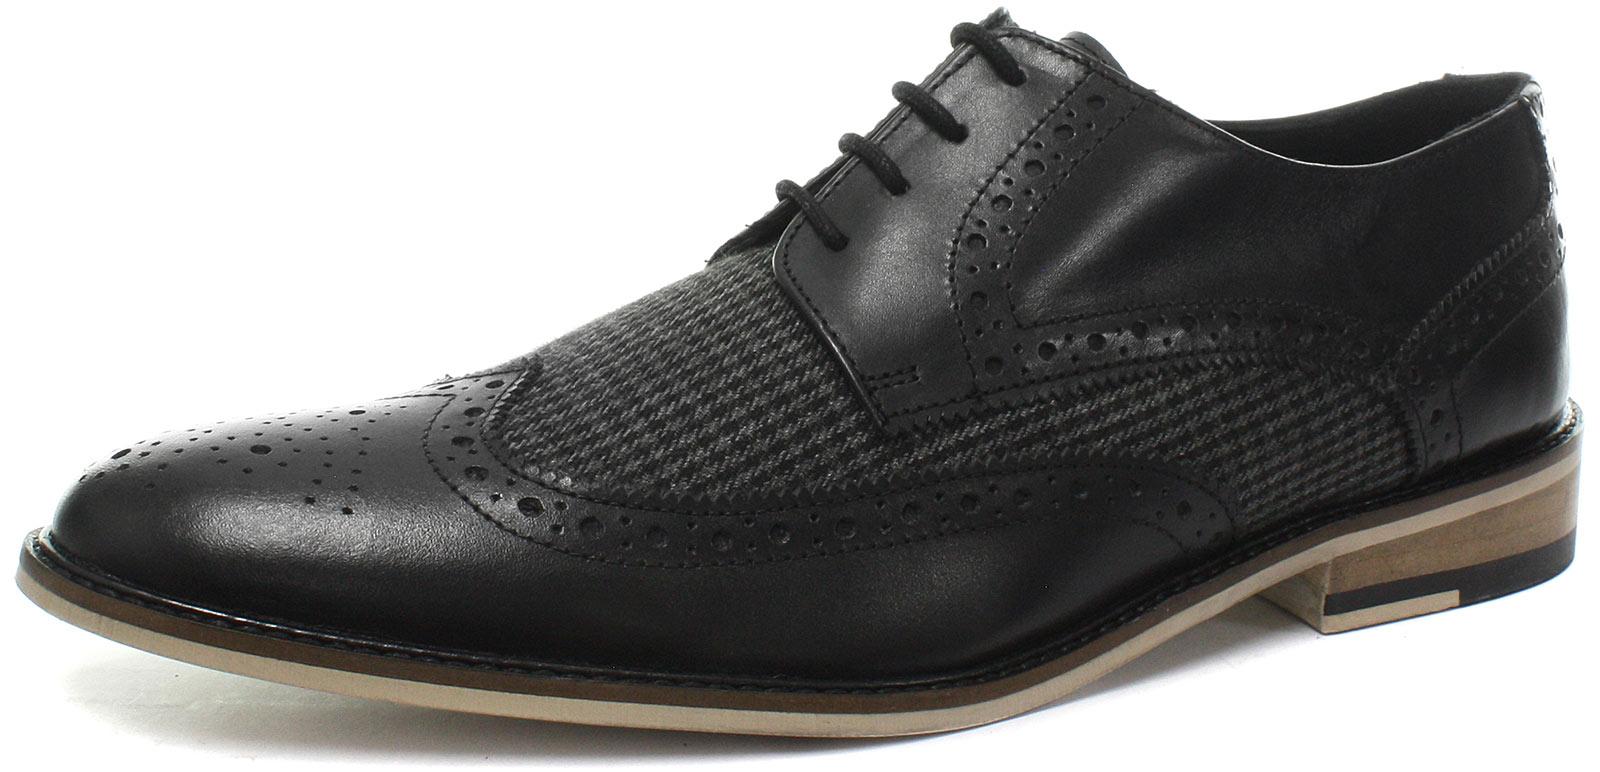 New Roamers 4 Eye Mens Wing Cap Gibson Black Mens Eye Brogue Shoes ALL SIZES b4b7f7